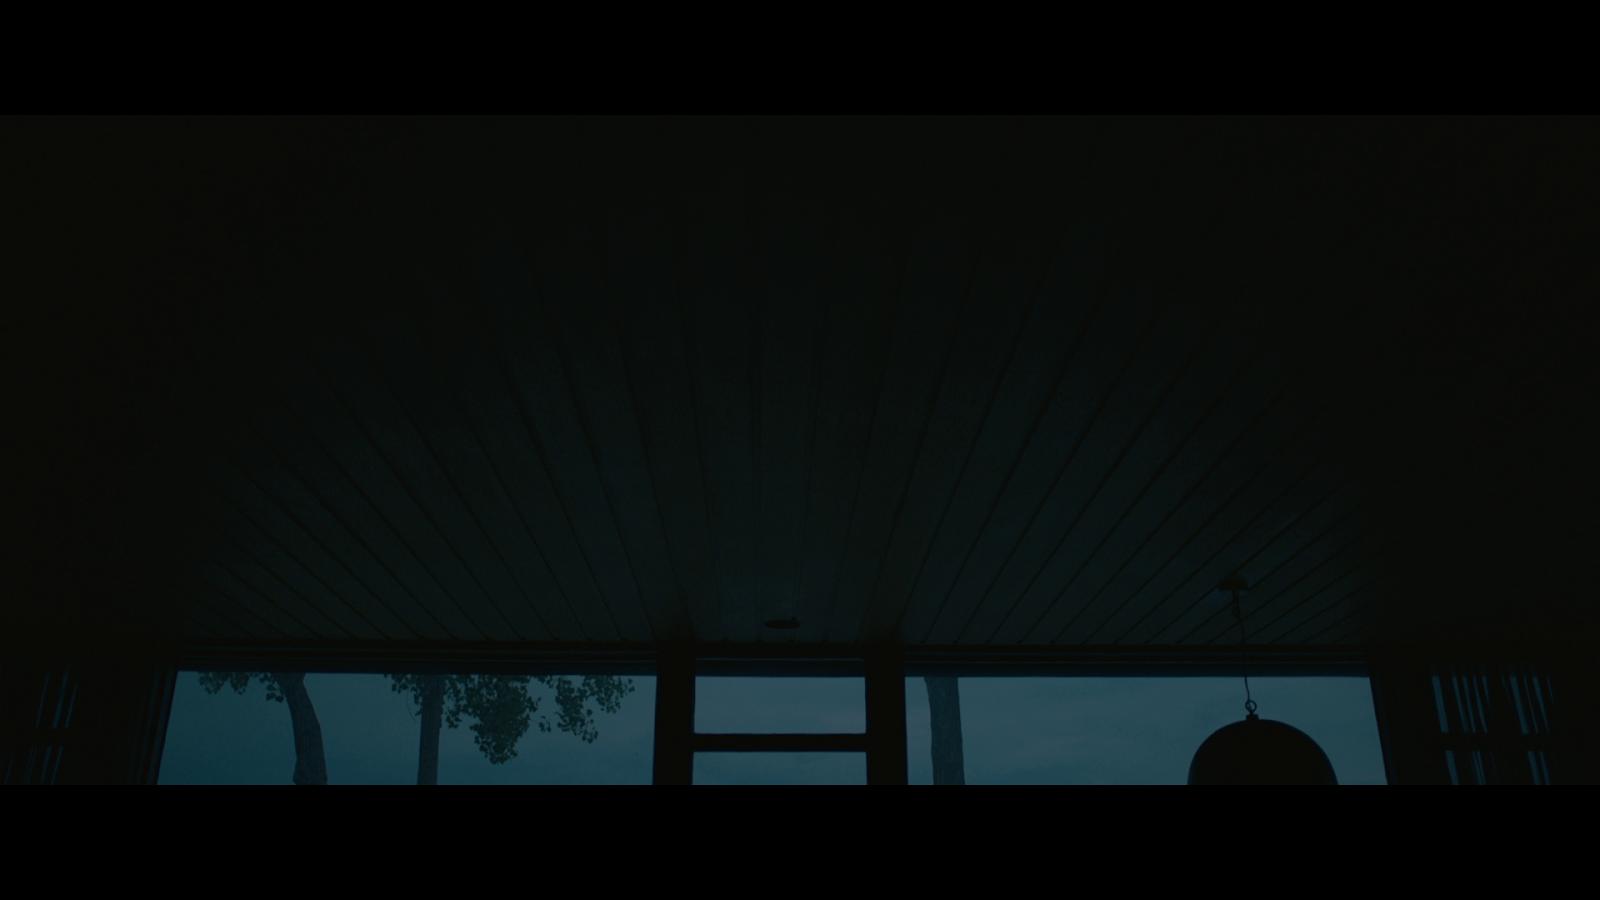 La LLegada (2016) 1080p BD25 LATINO 3